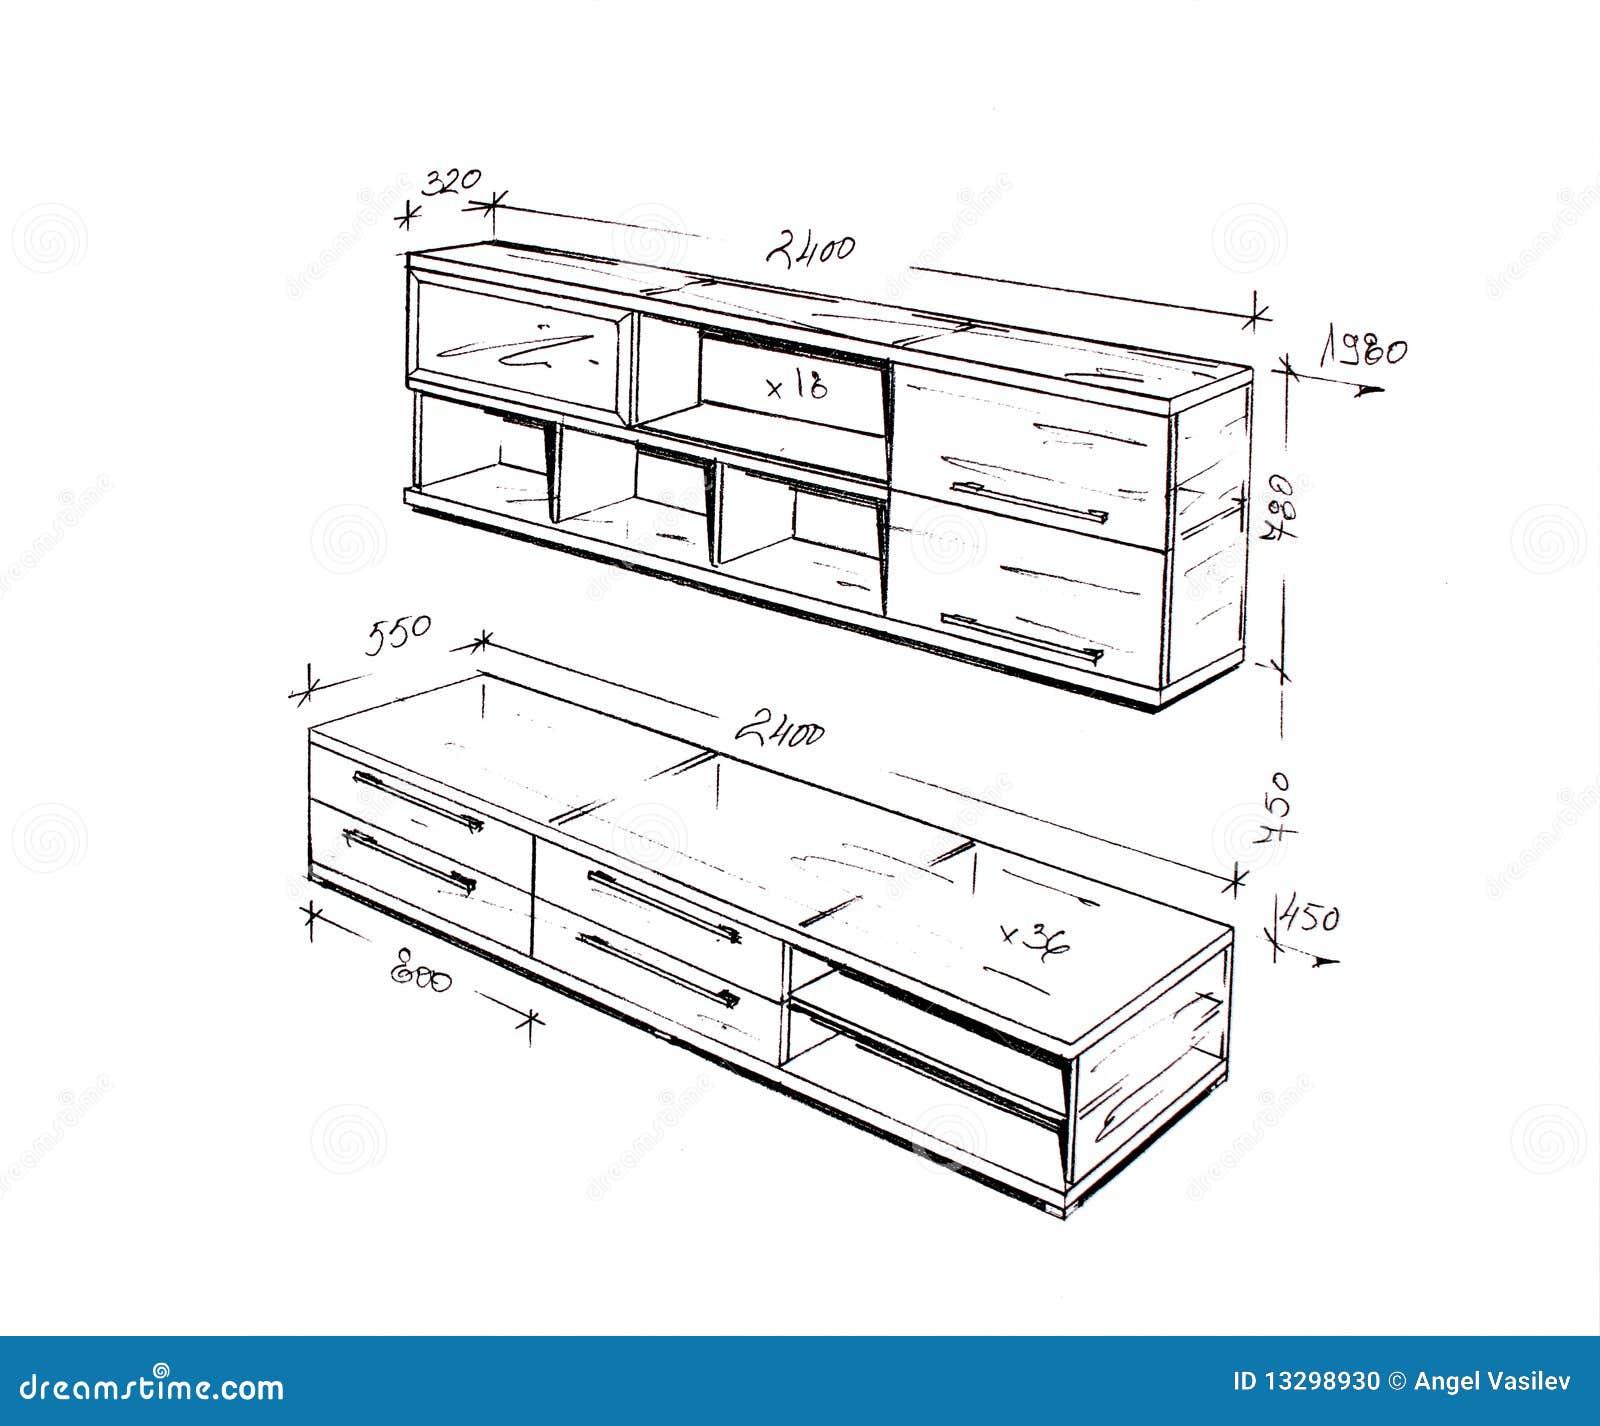 Interior design drawings modern interior design